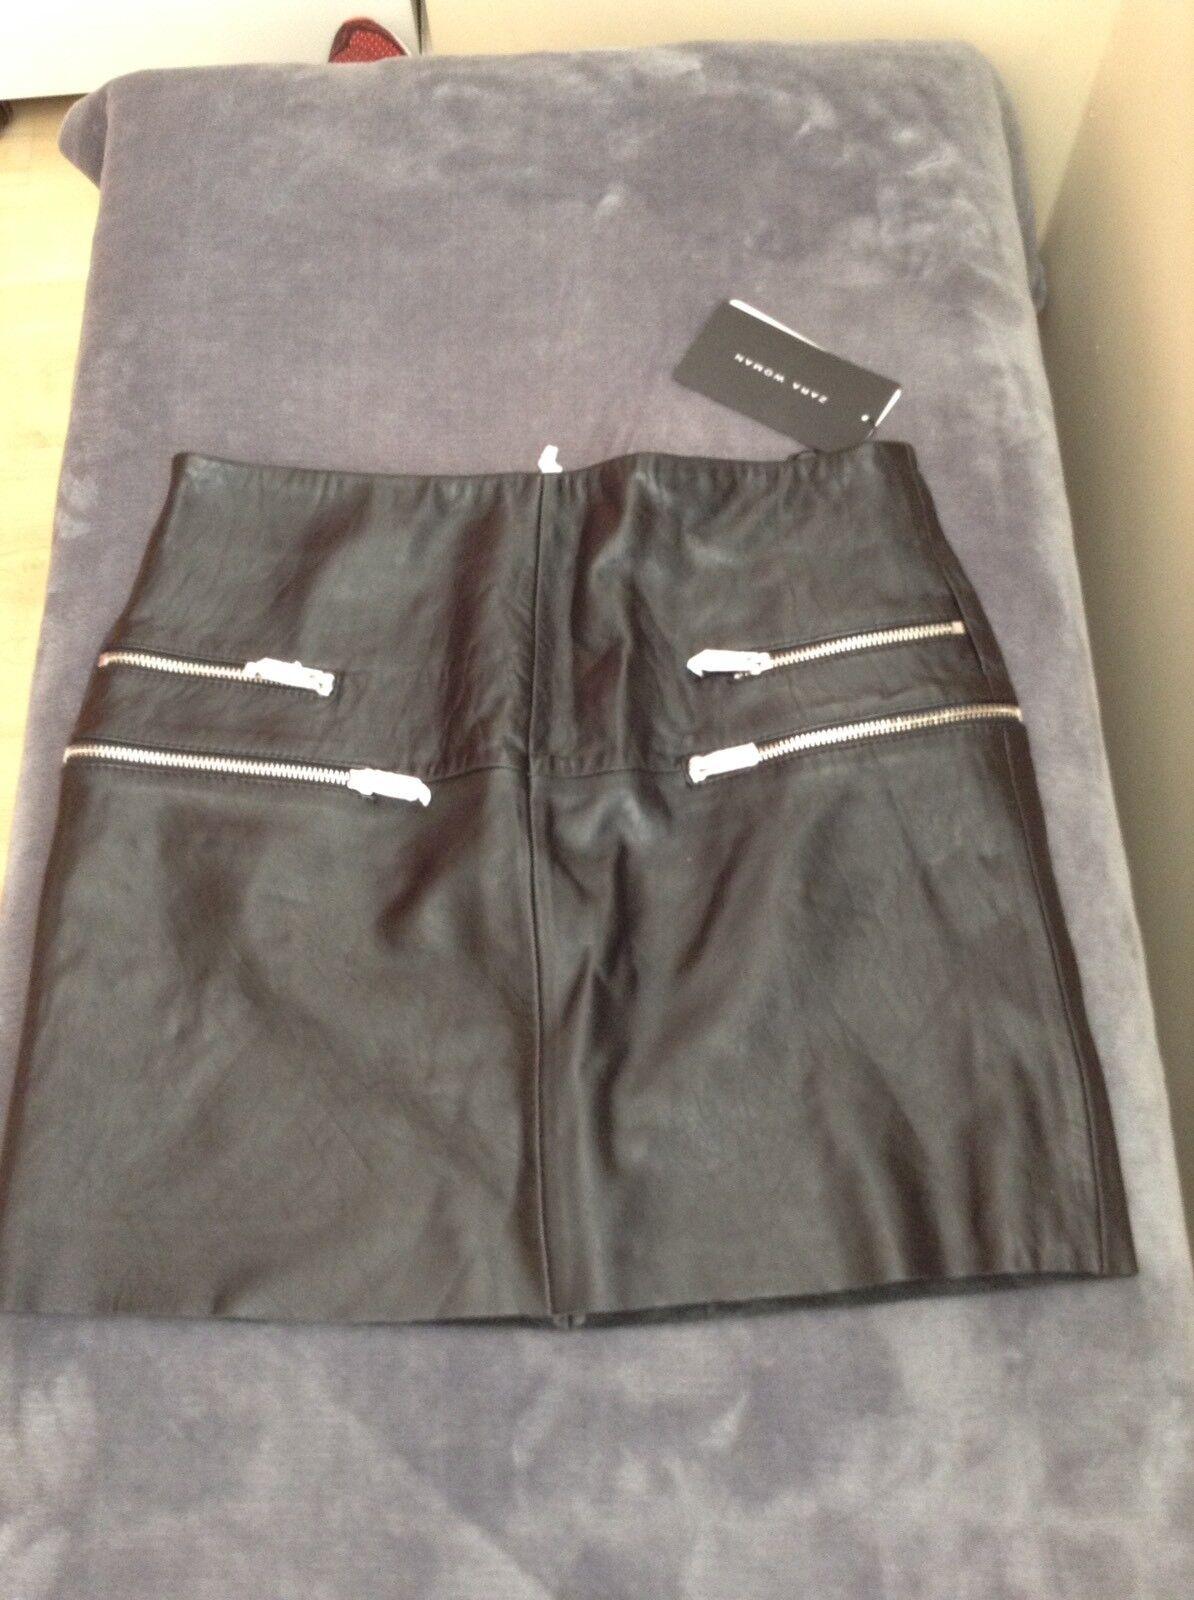 Zara Leather Skirt Nwt Size Small